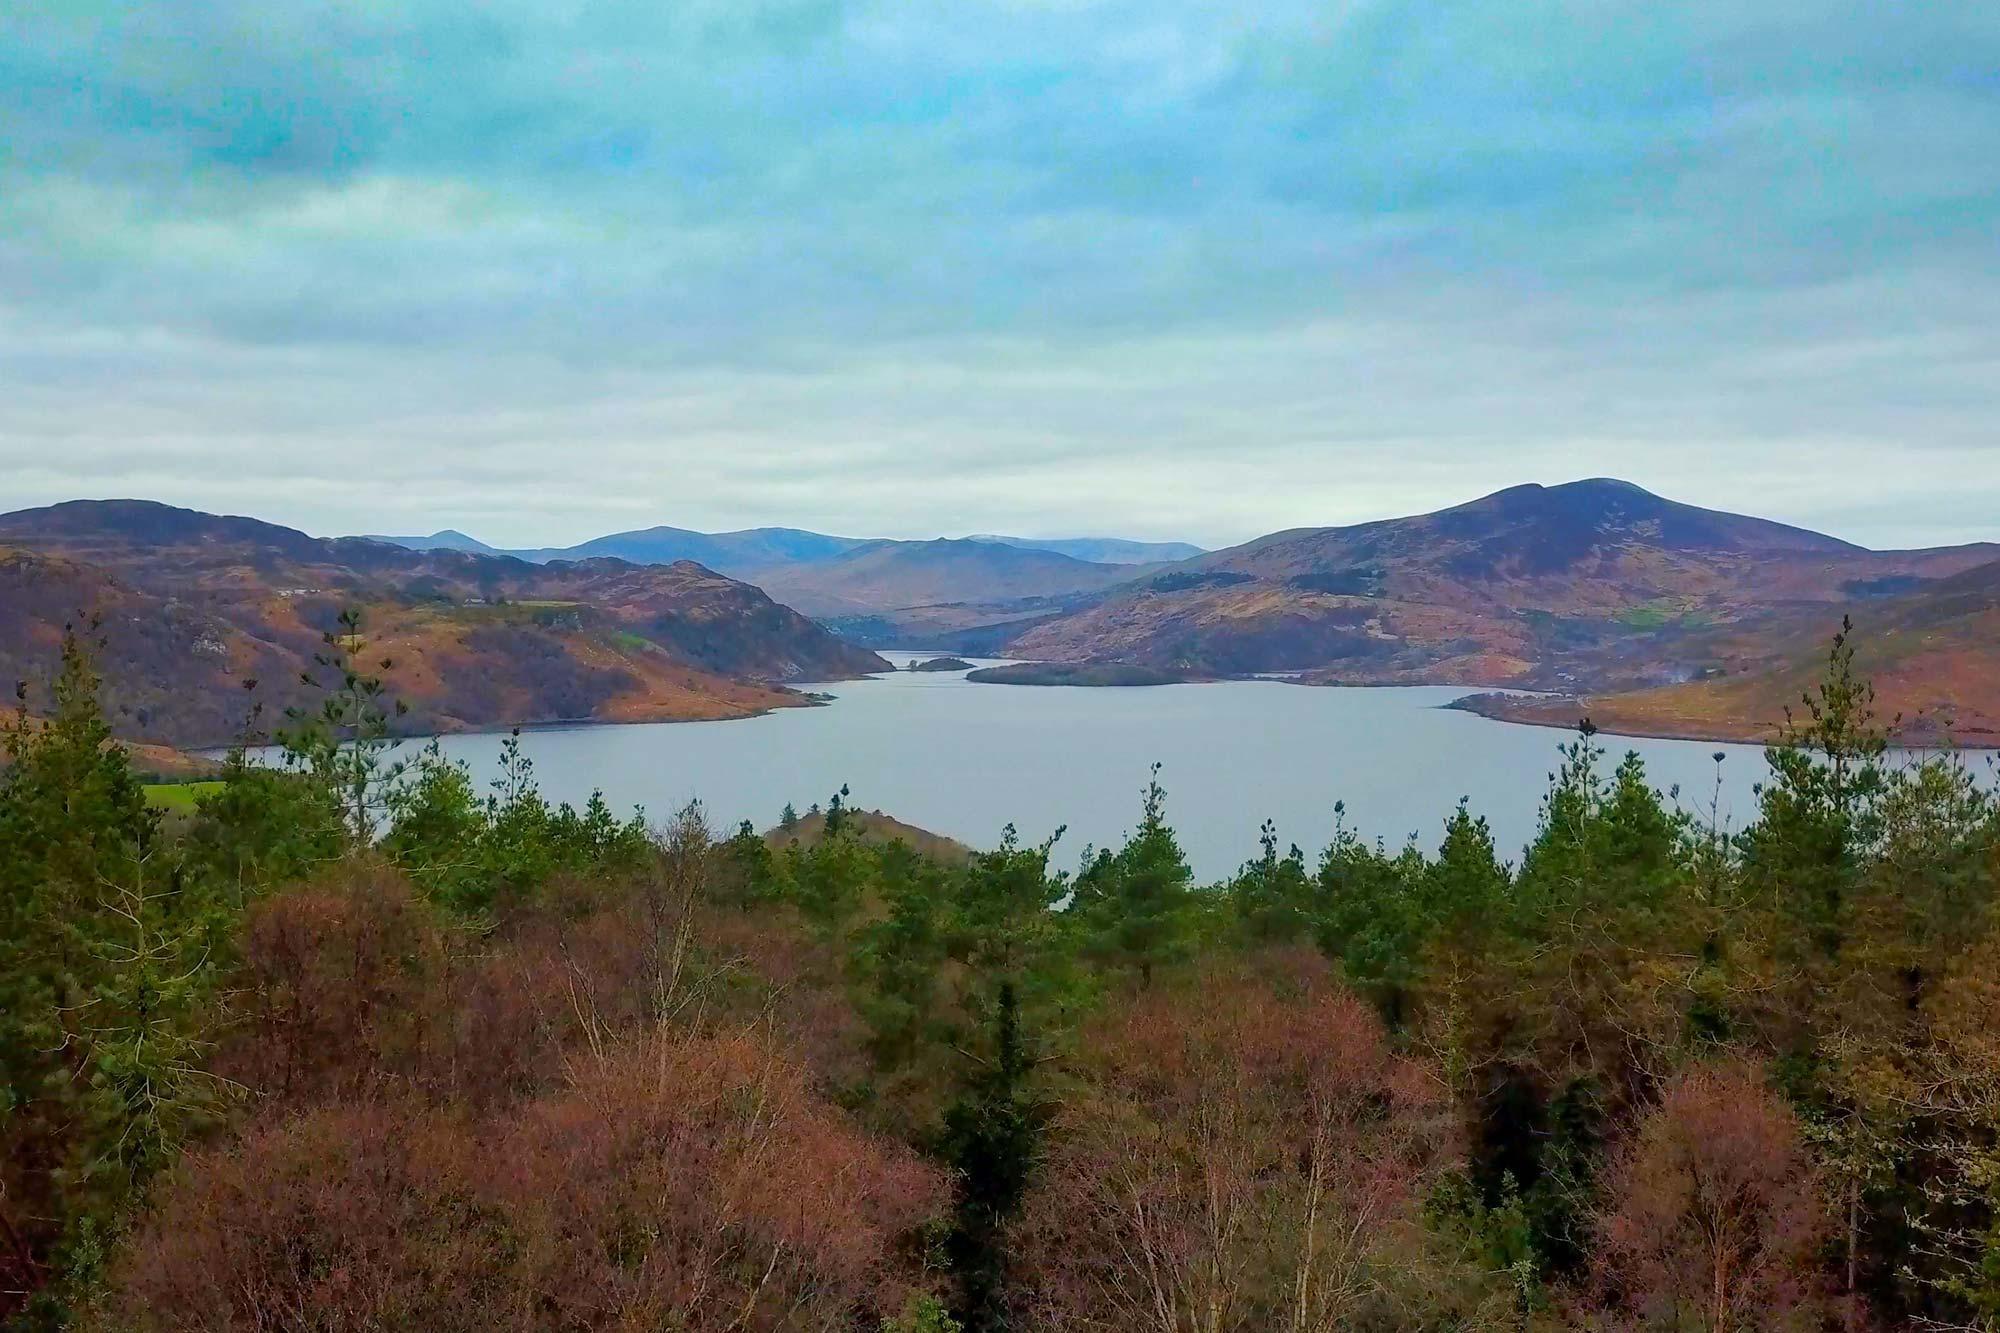 songs-of-earth-landscape-Fergus-Cahillane